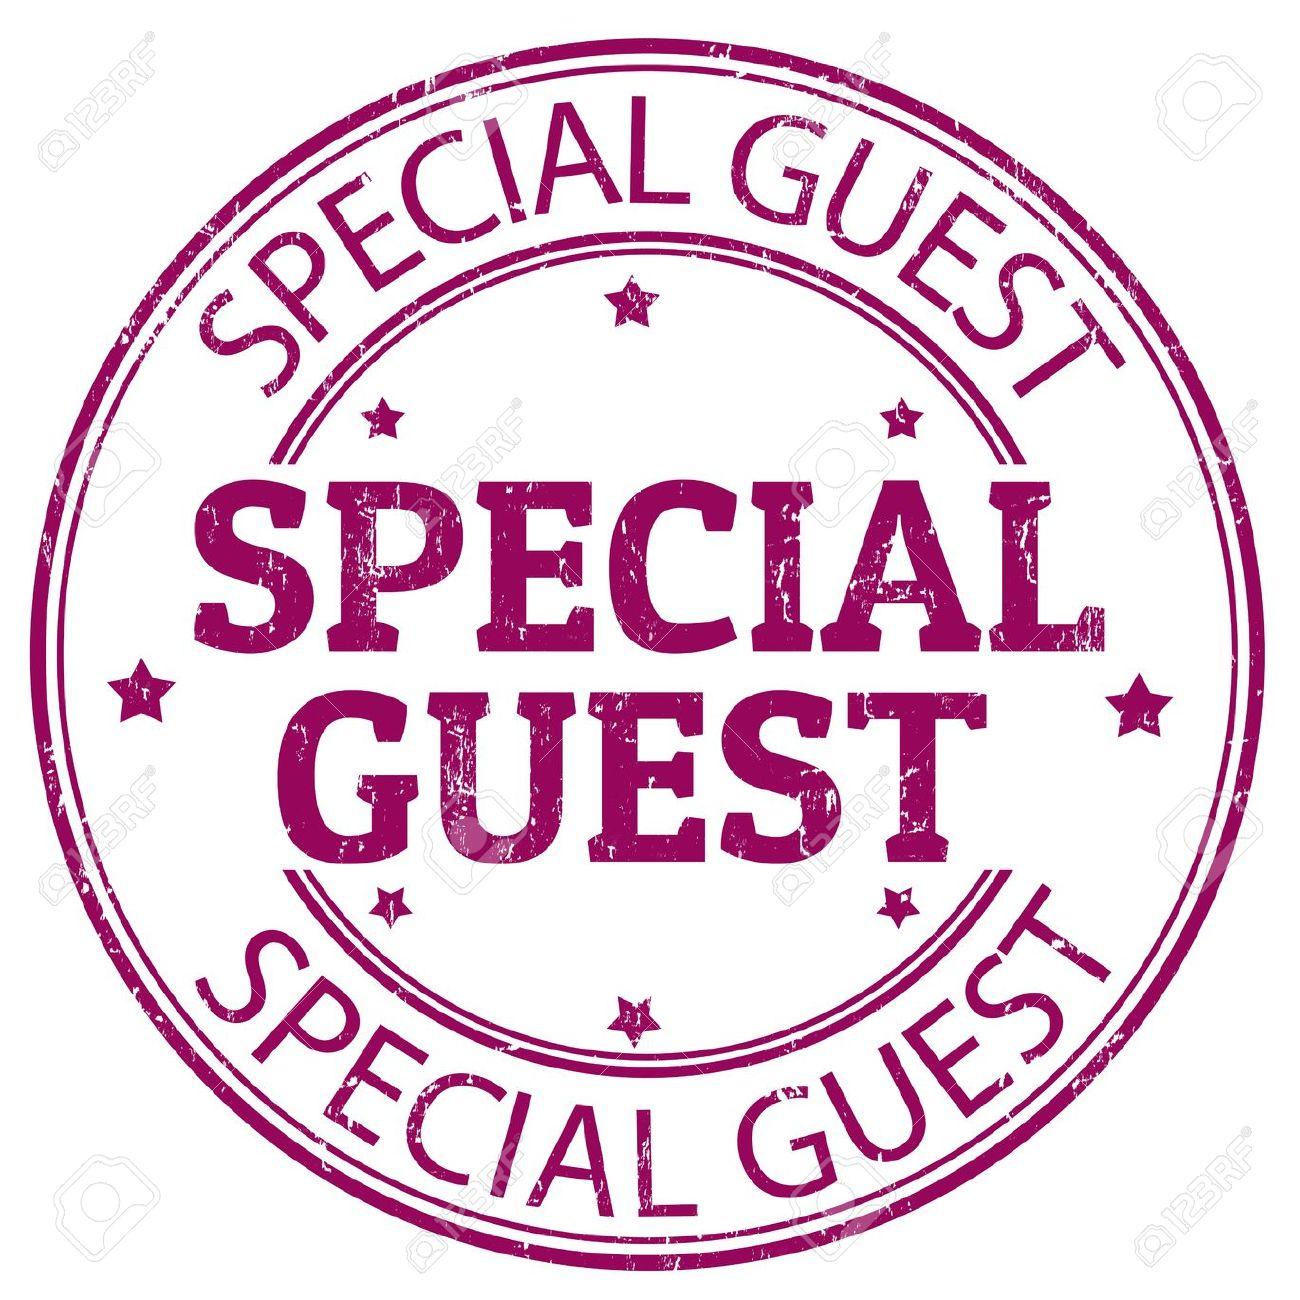 1f4762cbc6e8ce2d260b70360e6686ce_epi-212-m2m-special-guest-clipart_1300-1300